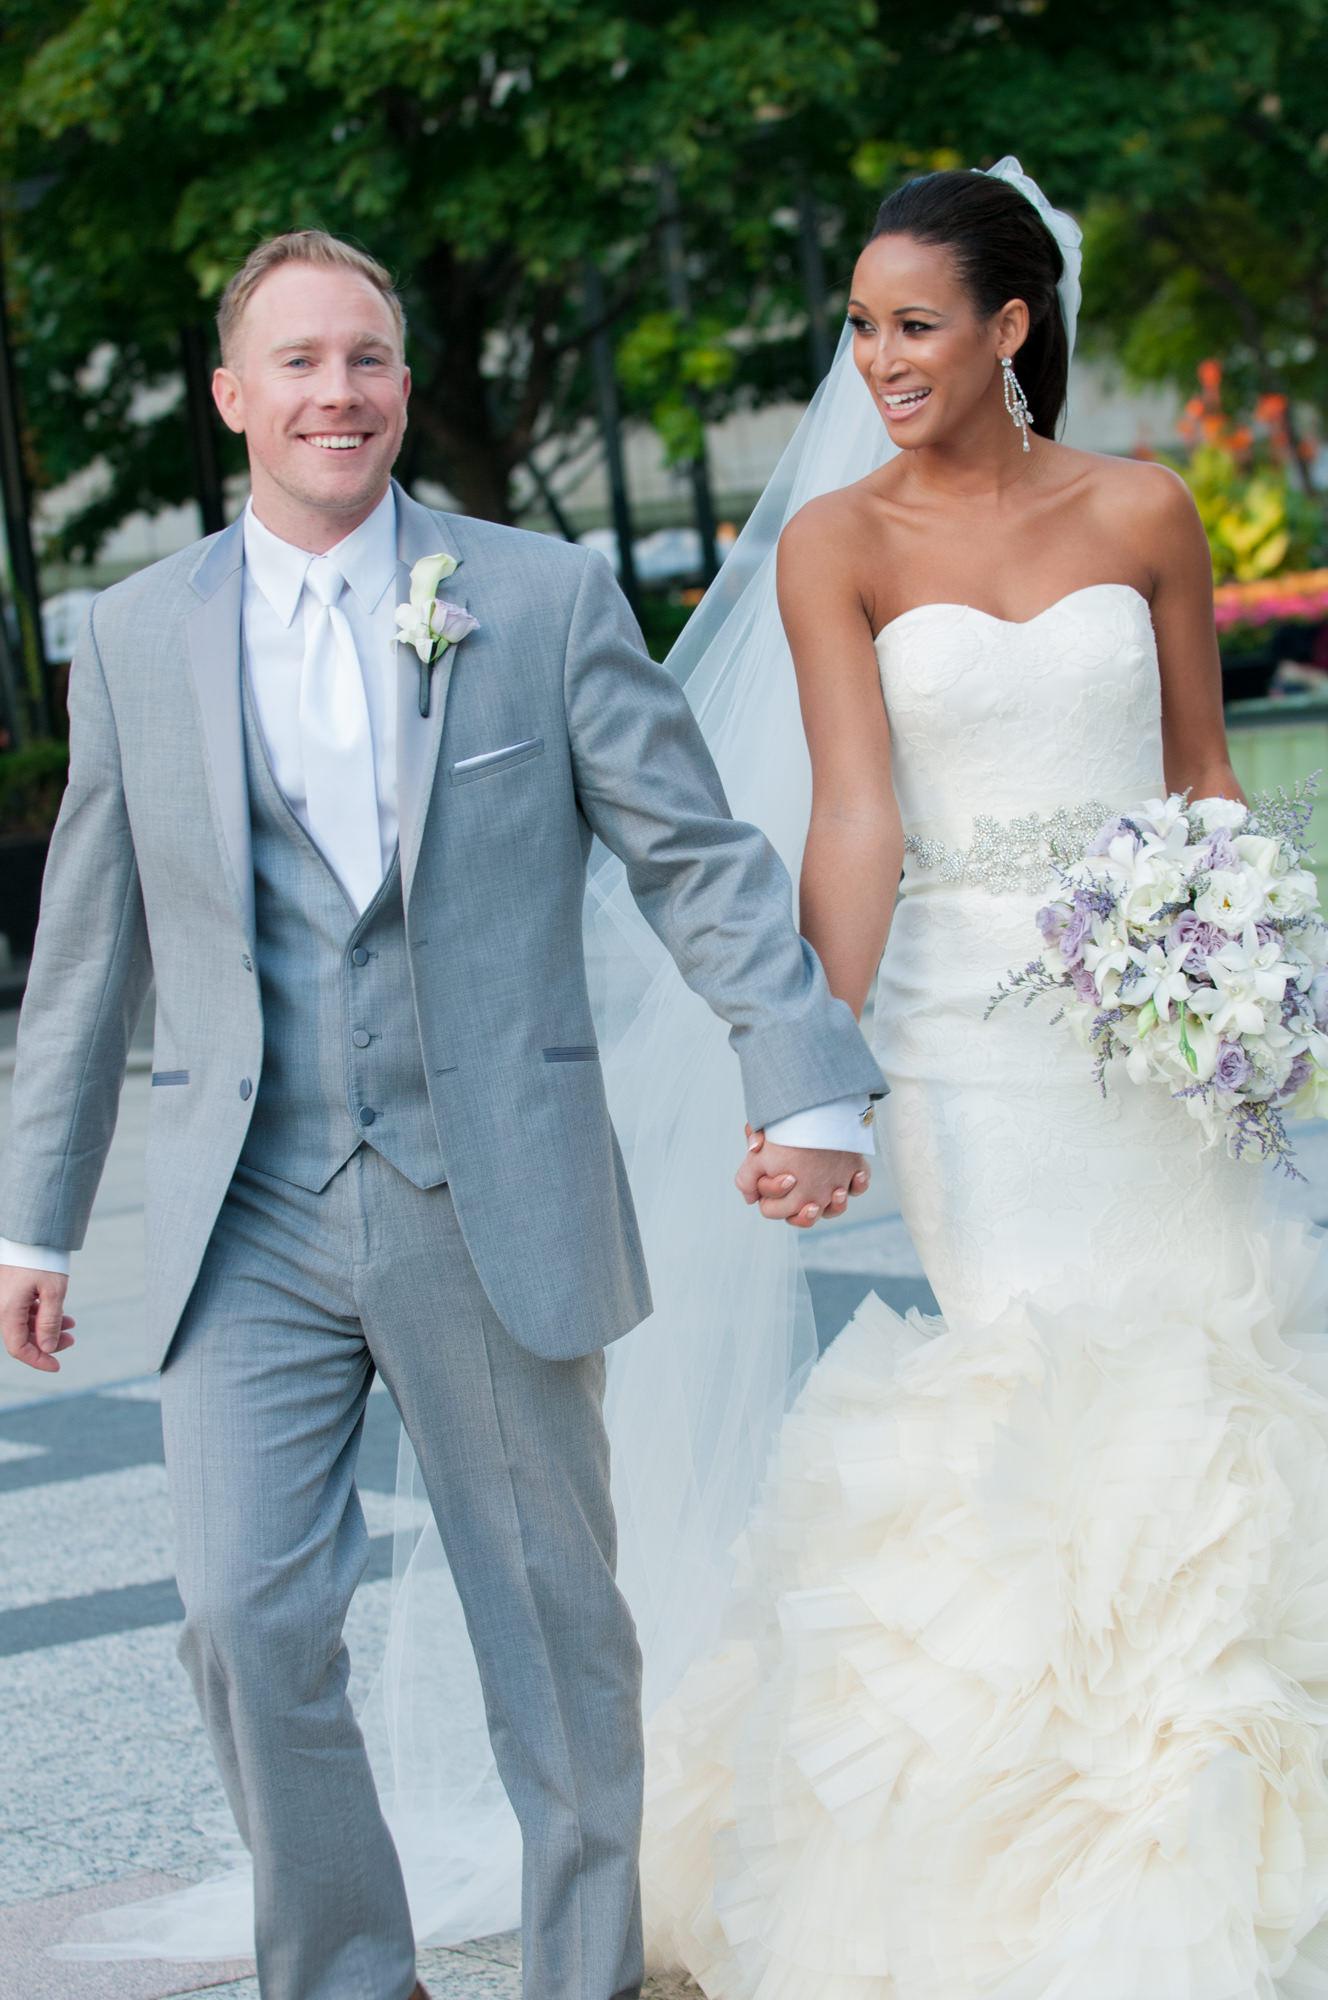 Bride Groom Walking Pioneer Court Chicago